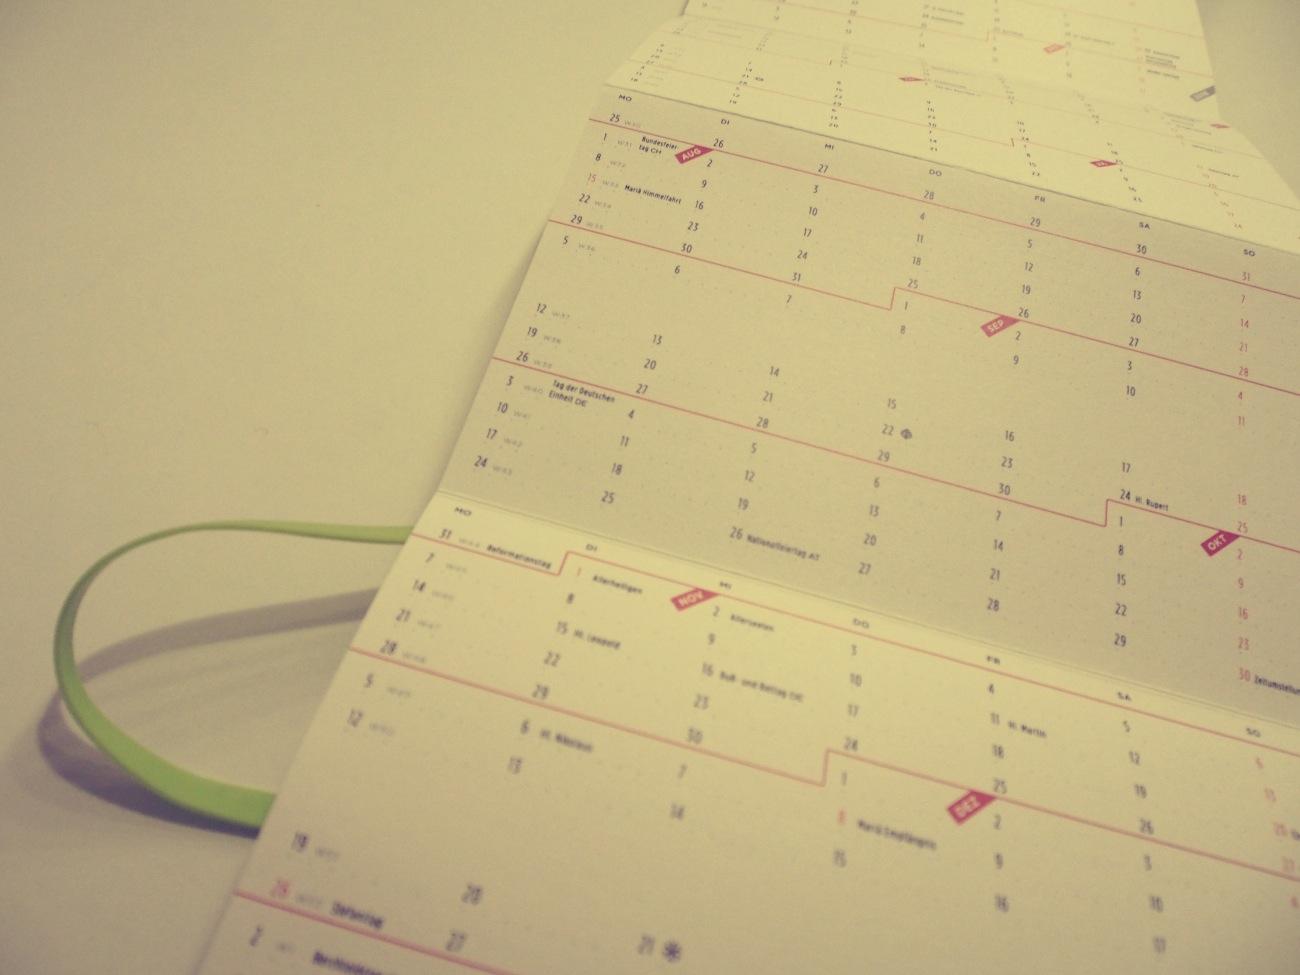 lessthingz ein leporello kalender zoomlab. Black Bedroom Furniture Sets. Home Design Ideas